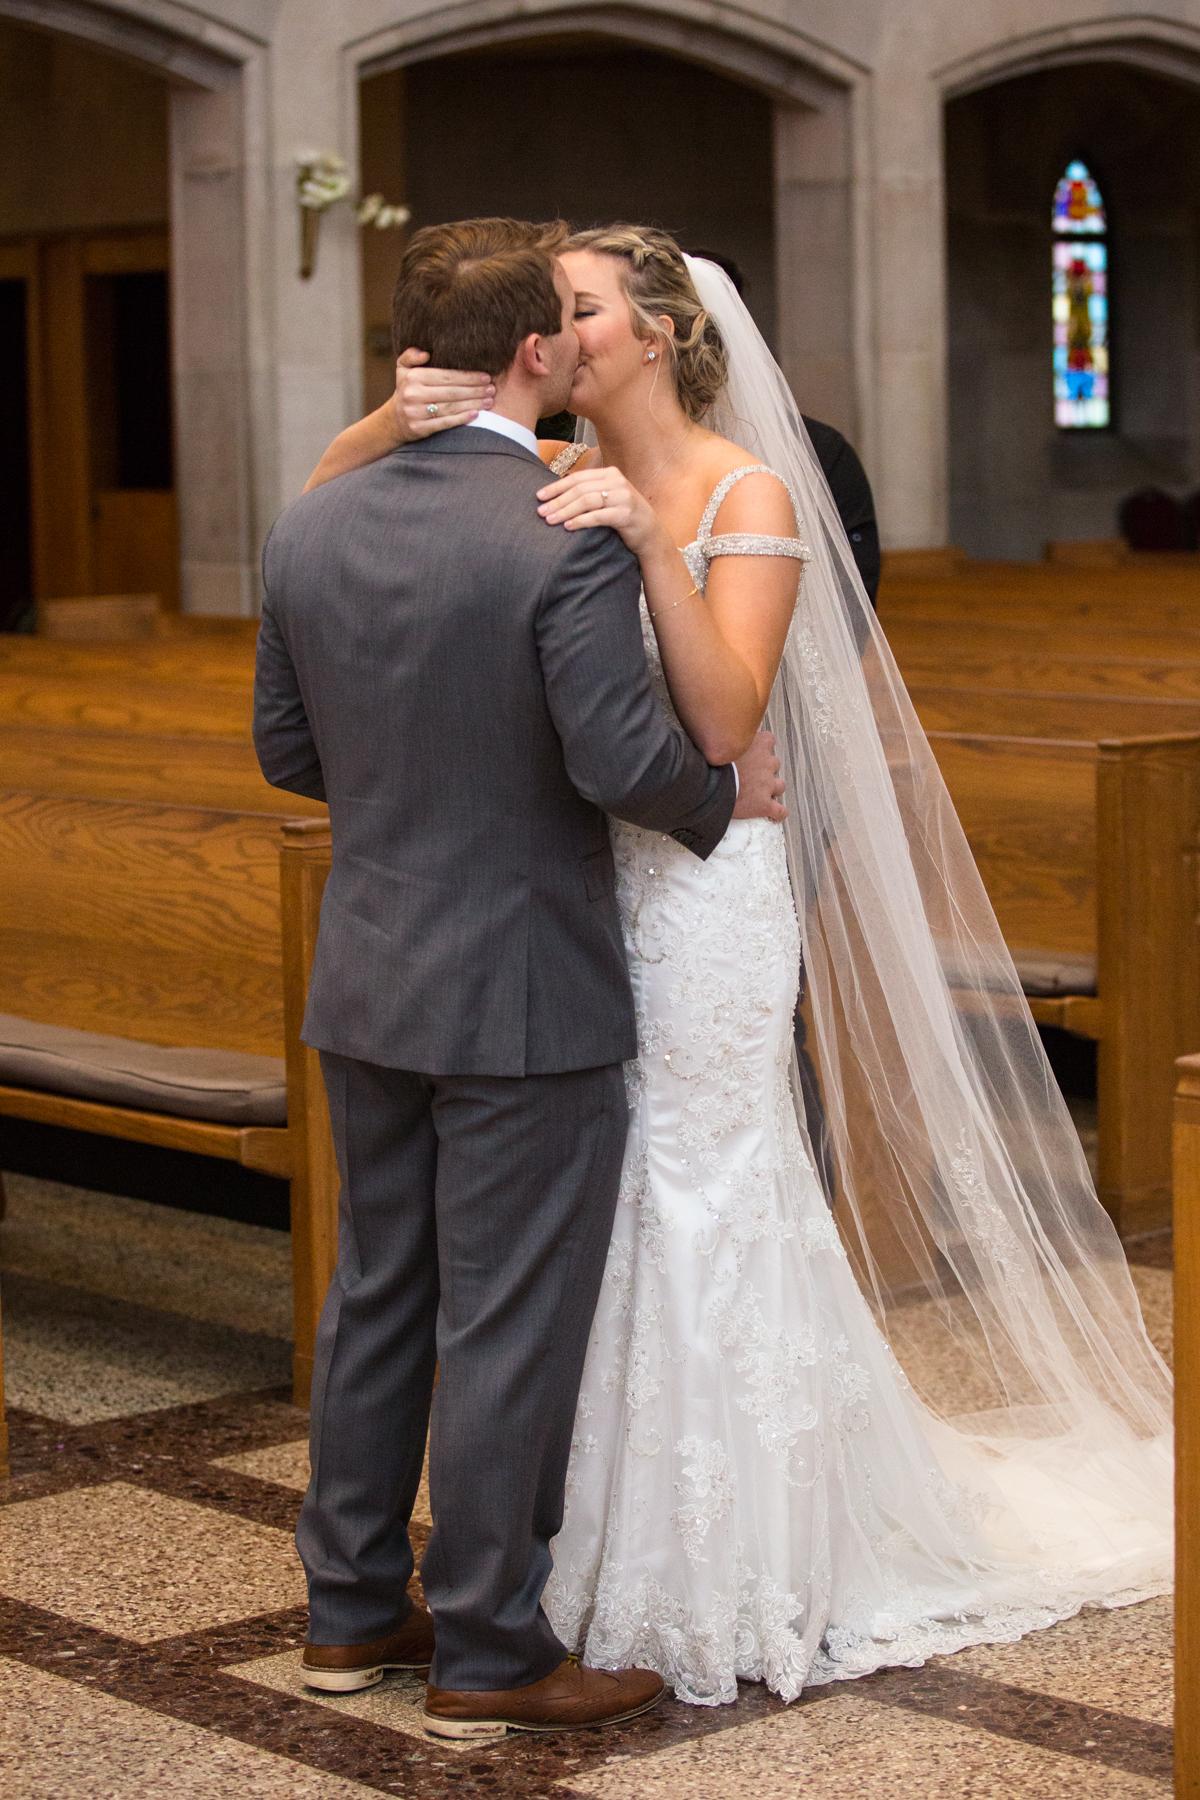 Kelli-and-Matt-Nashville-Wedding-Sneak-Peak-0111.jpg